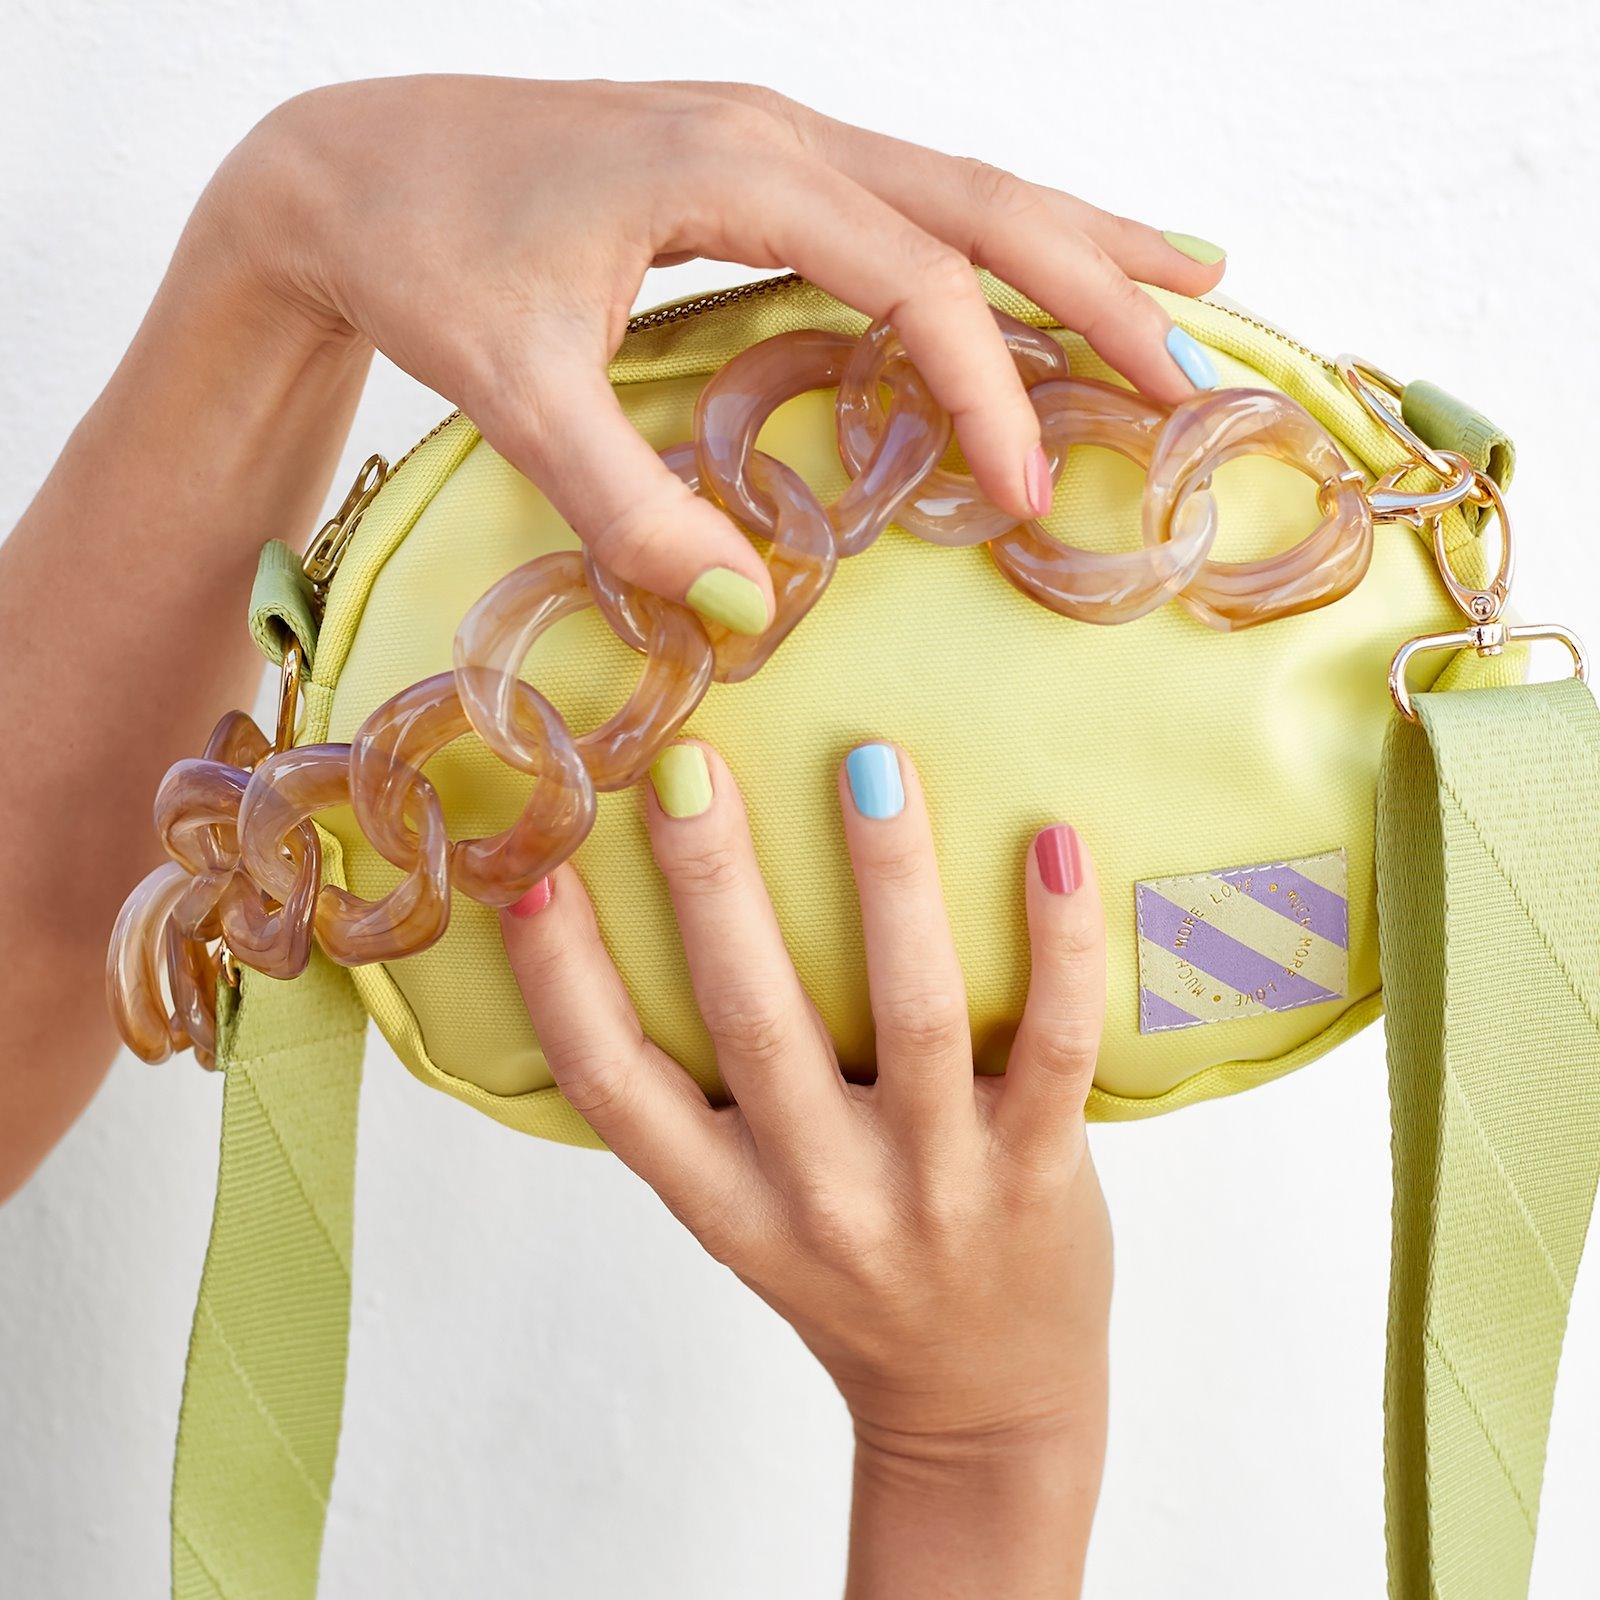 Chain handle 53cm caramel 1pc p90318_780480_95597_82407_46302_45519_45506_45523_26503_sskit